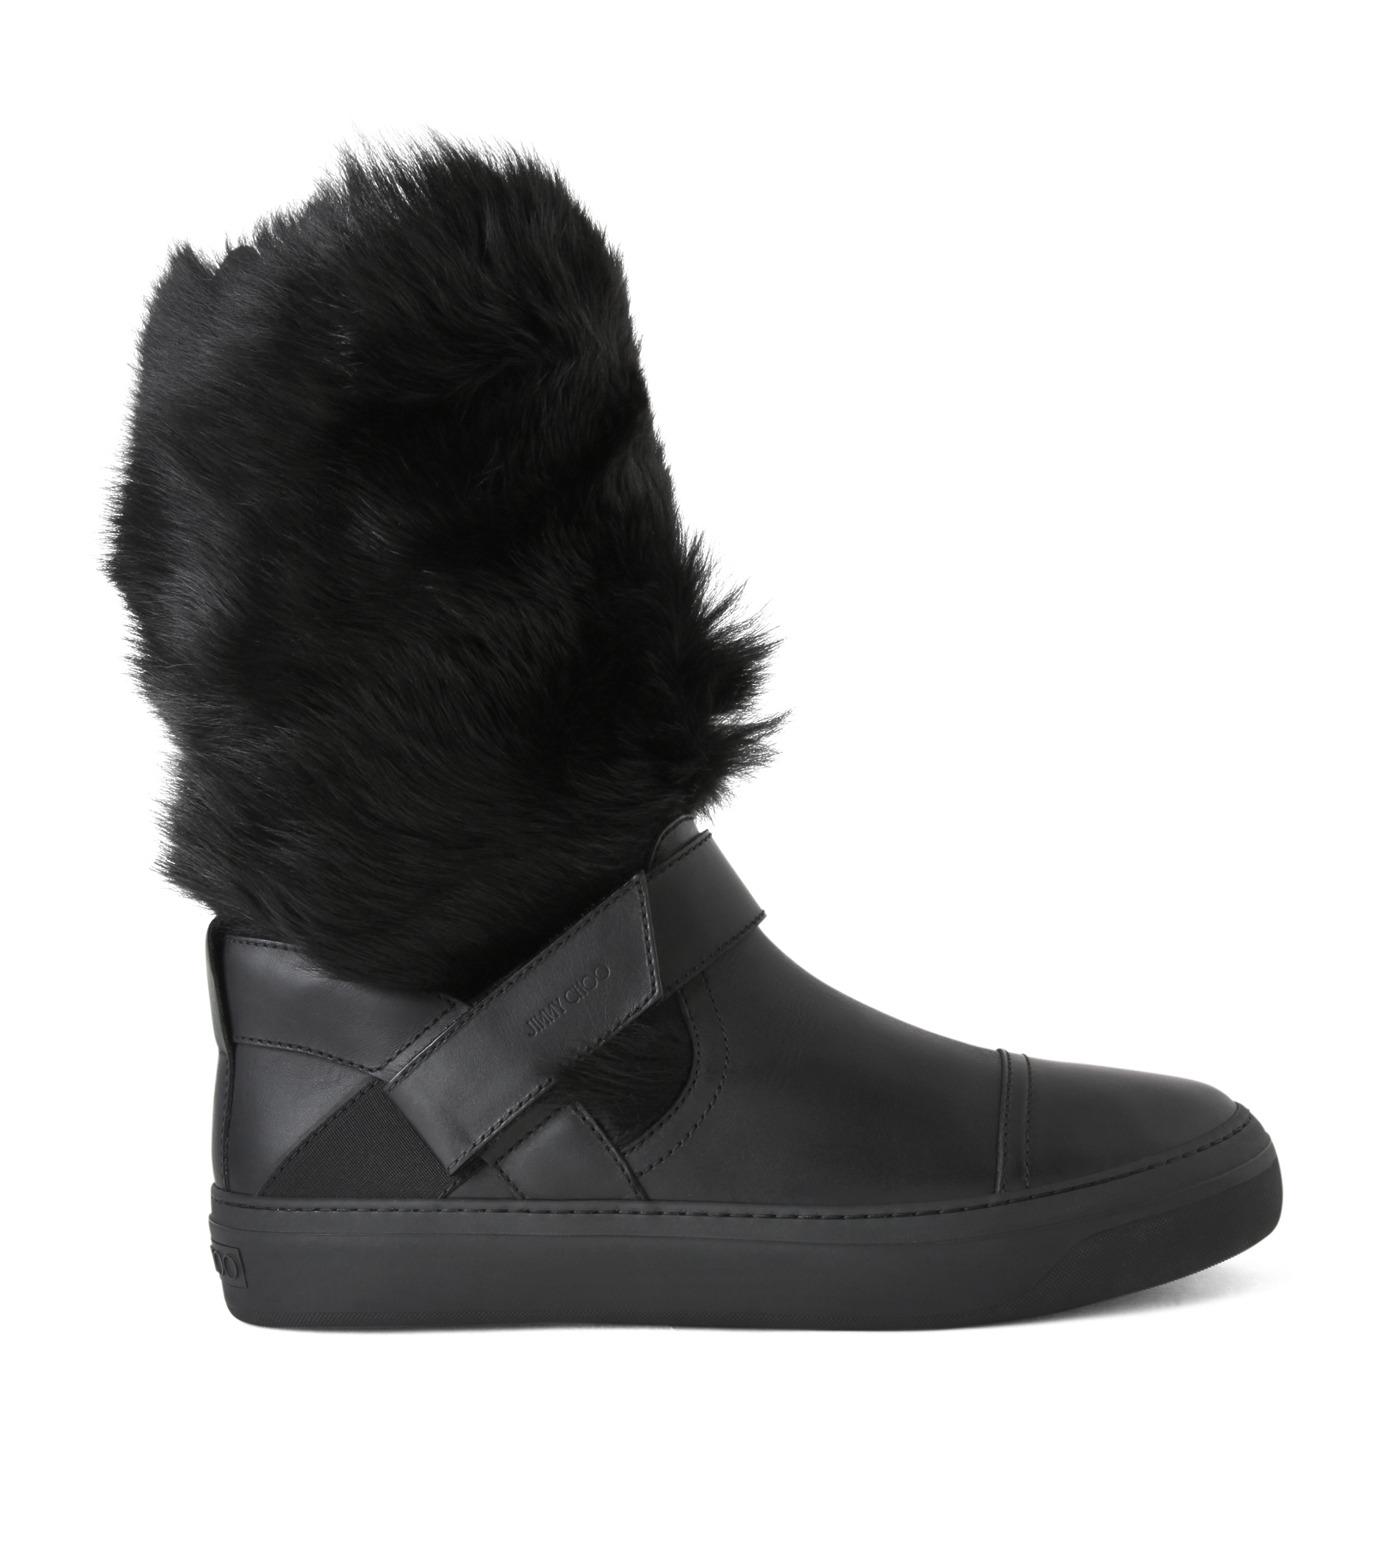 Jimmy Choo(ジミーチュウ)のFur Boots-BLACK(ブーツ/boots)-152BARRY-LWF-13 拡大詳細画像1